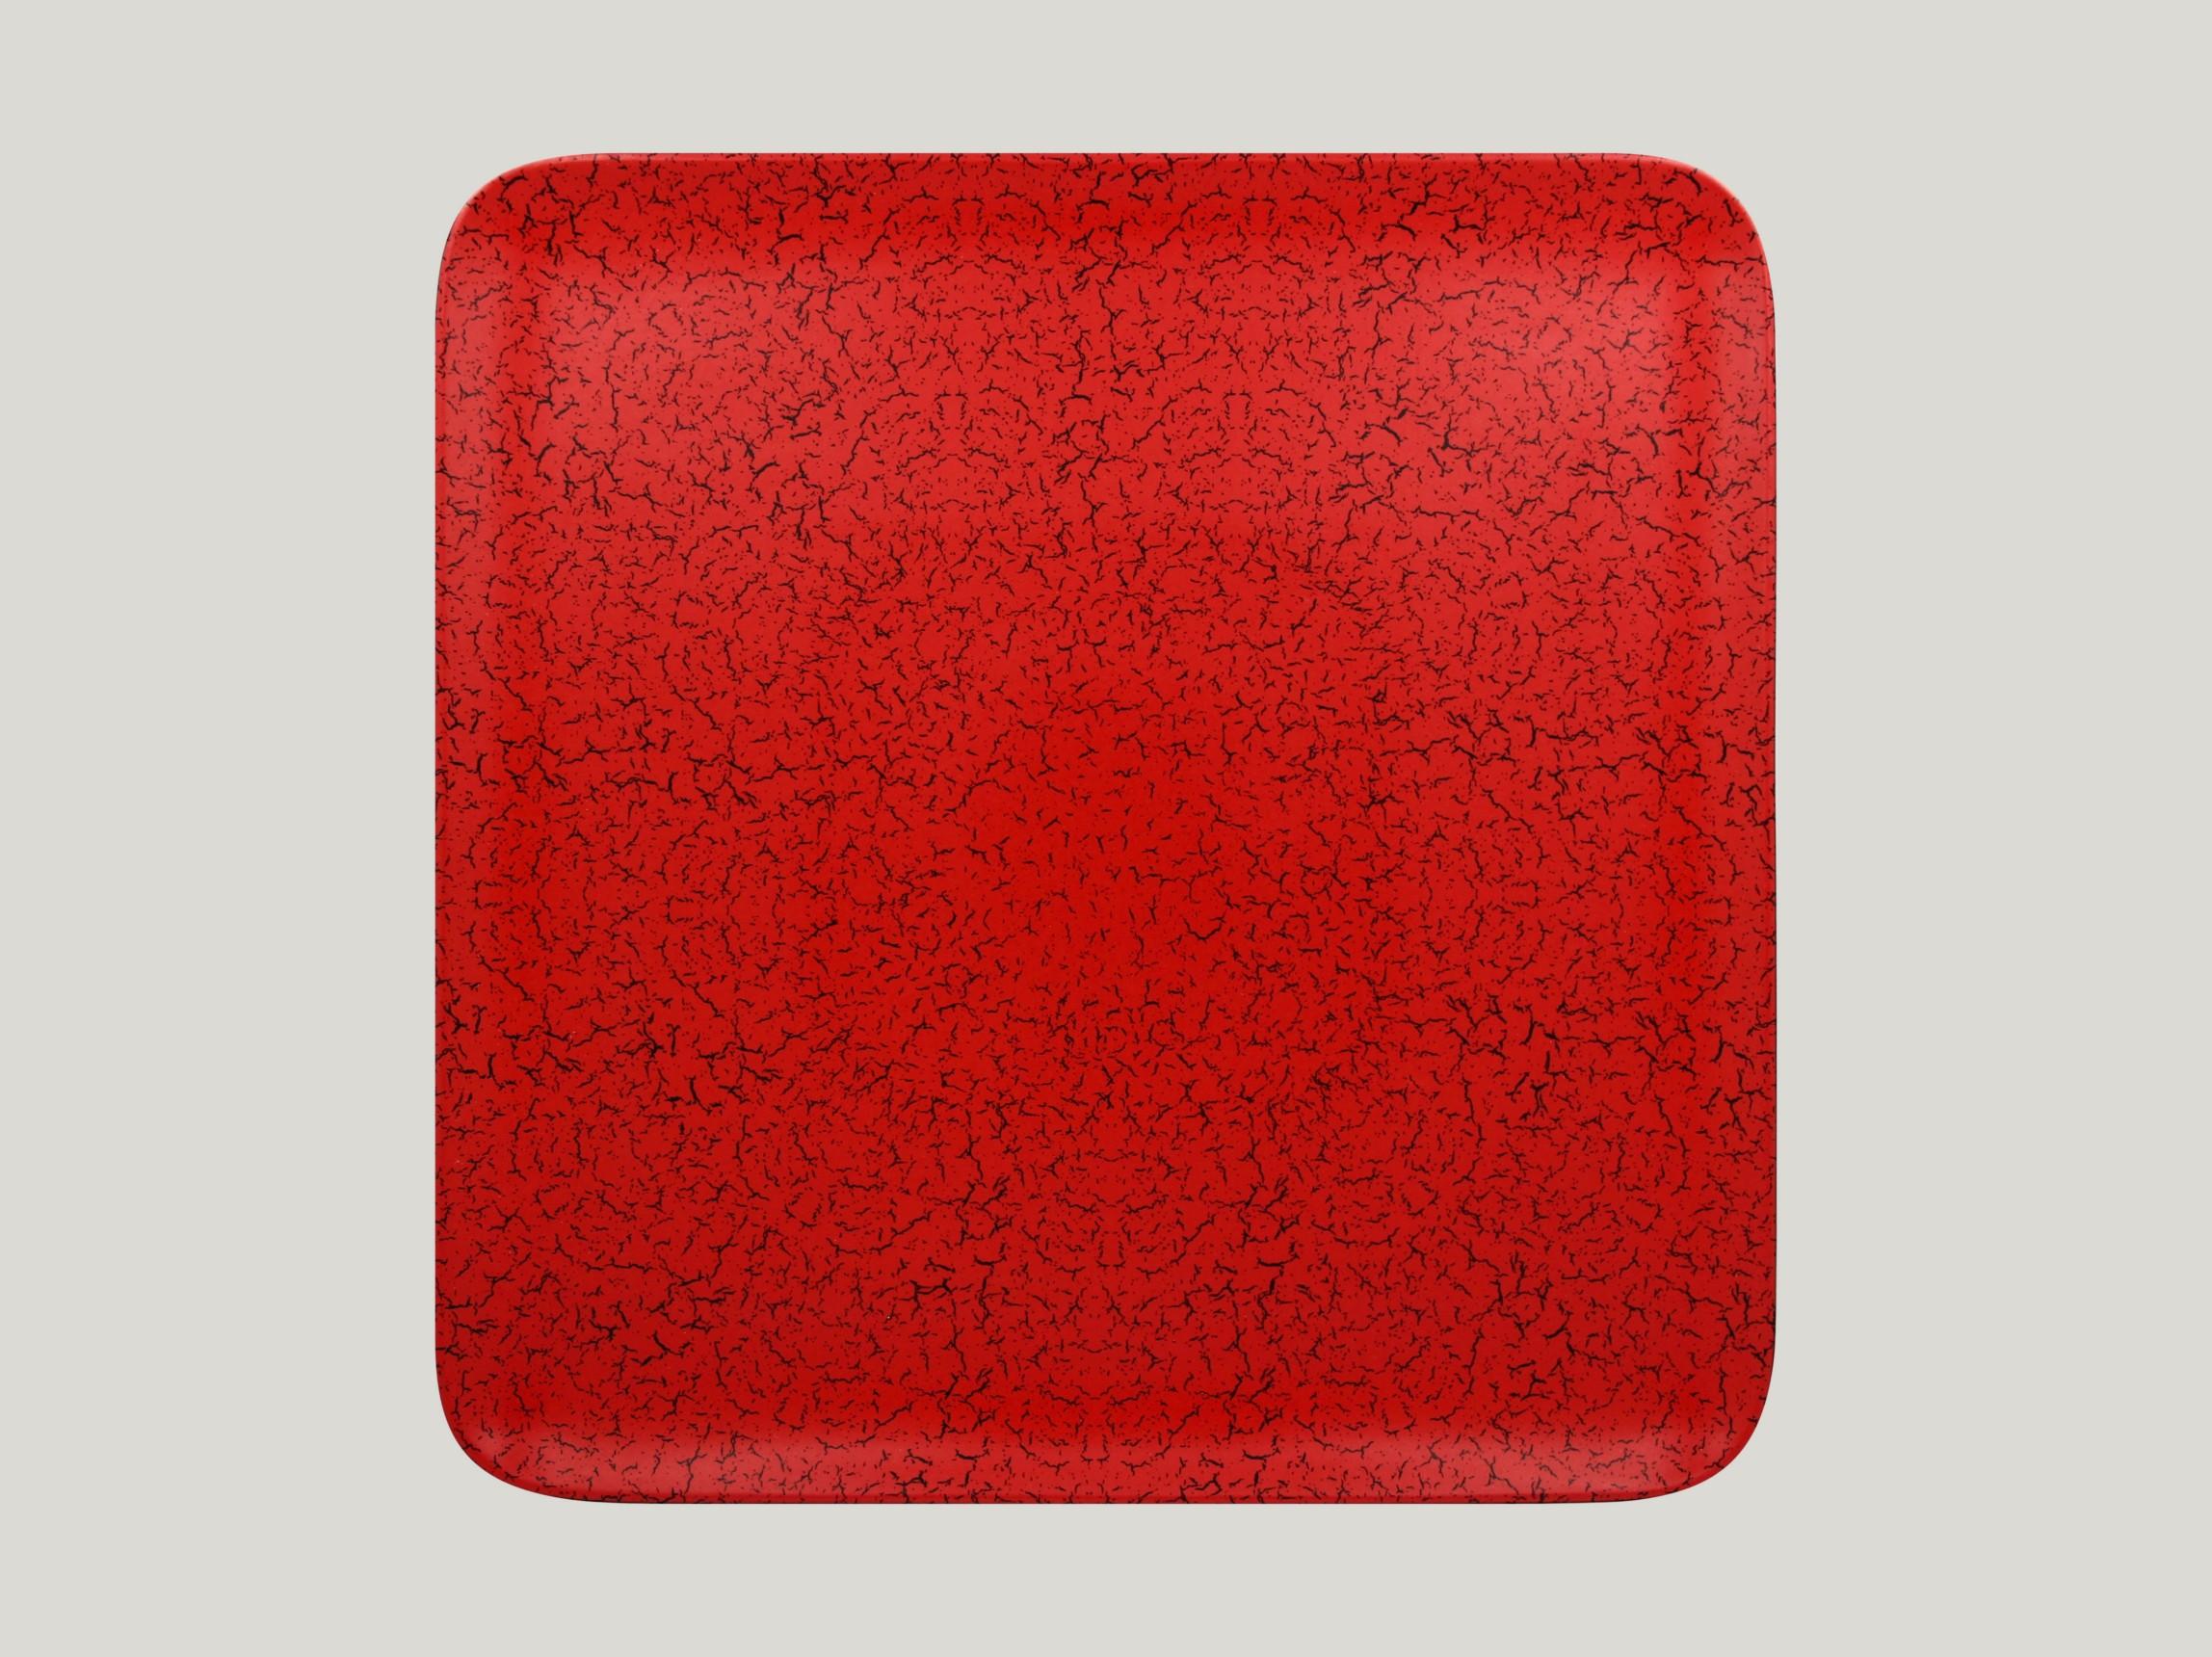 Talíř čtvercový 33 x 33 cm - červená